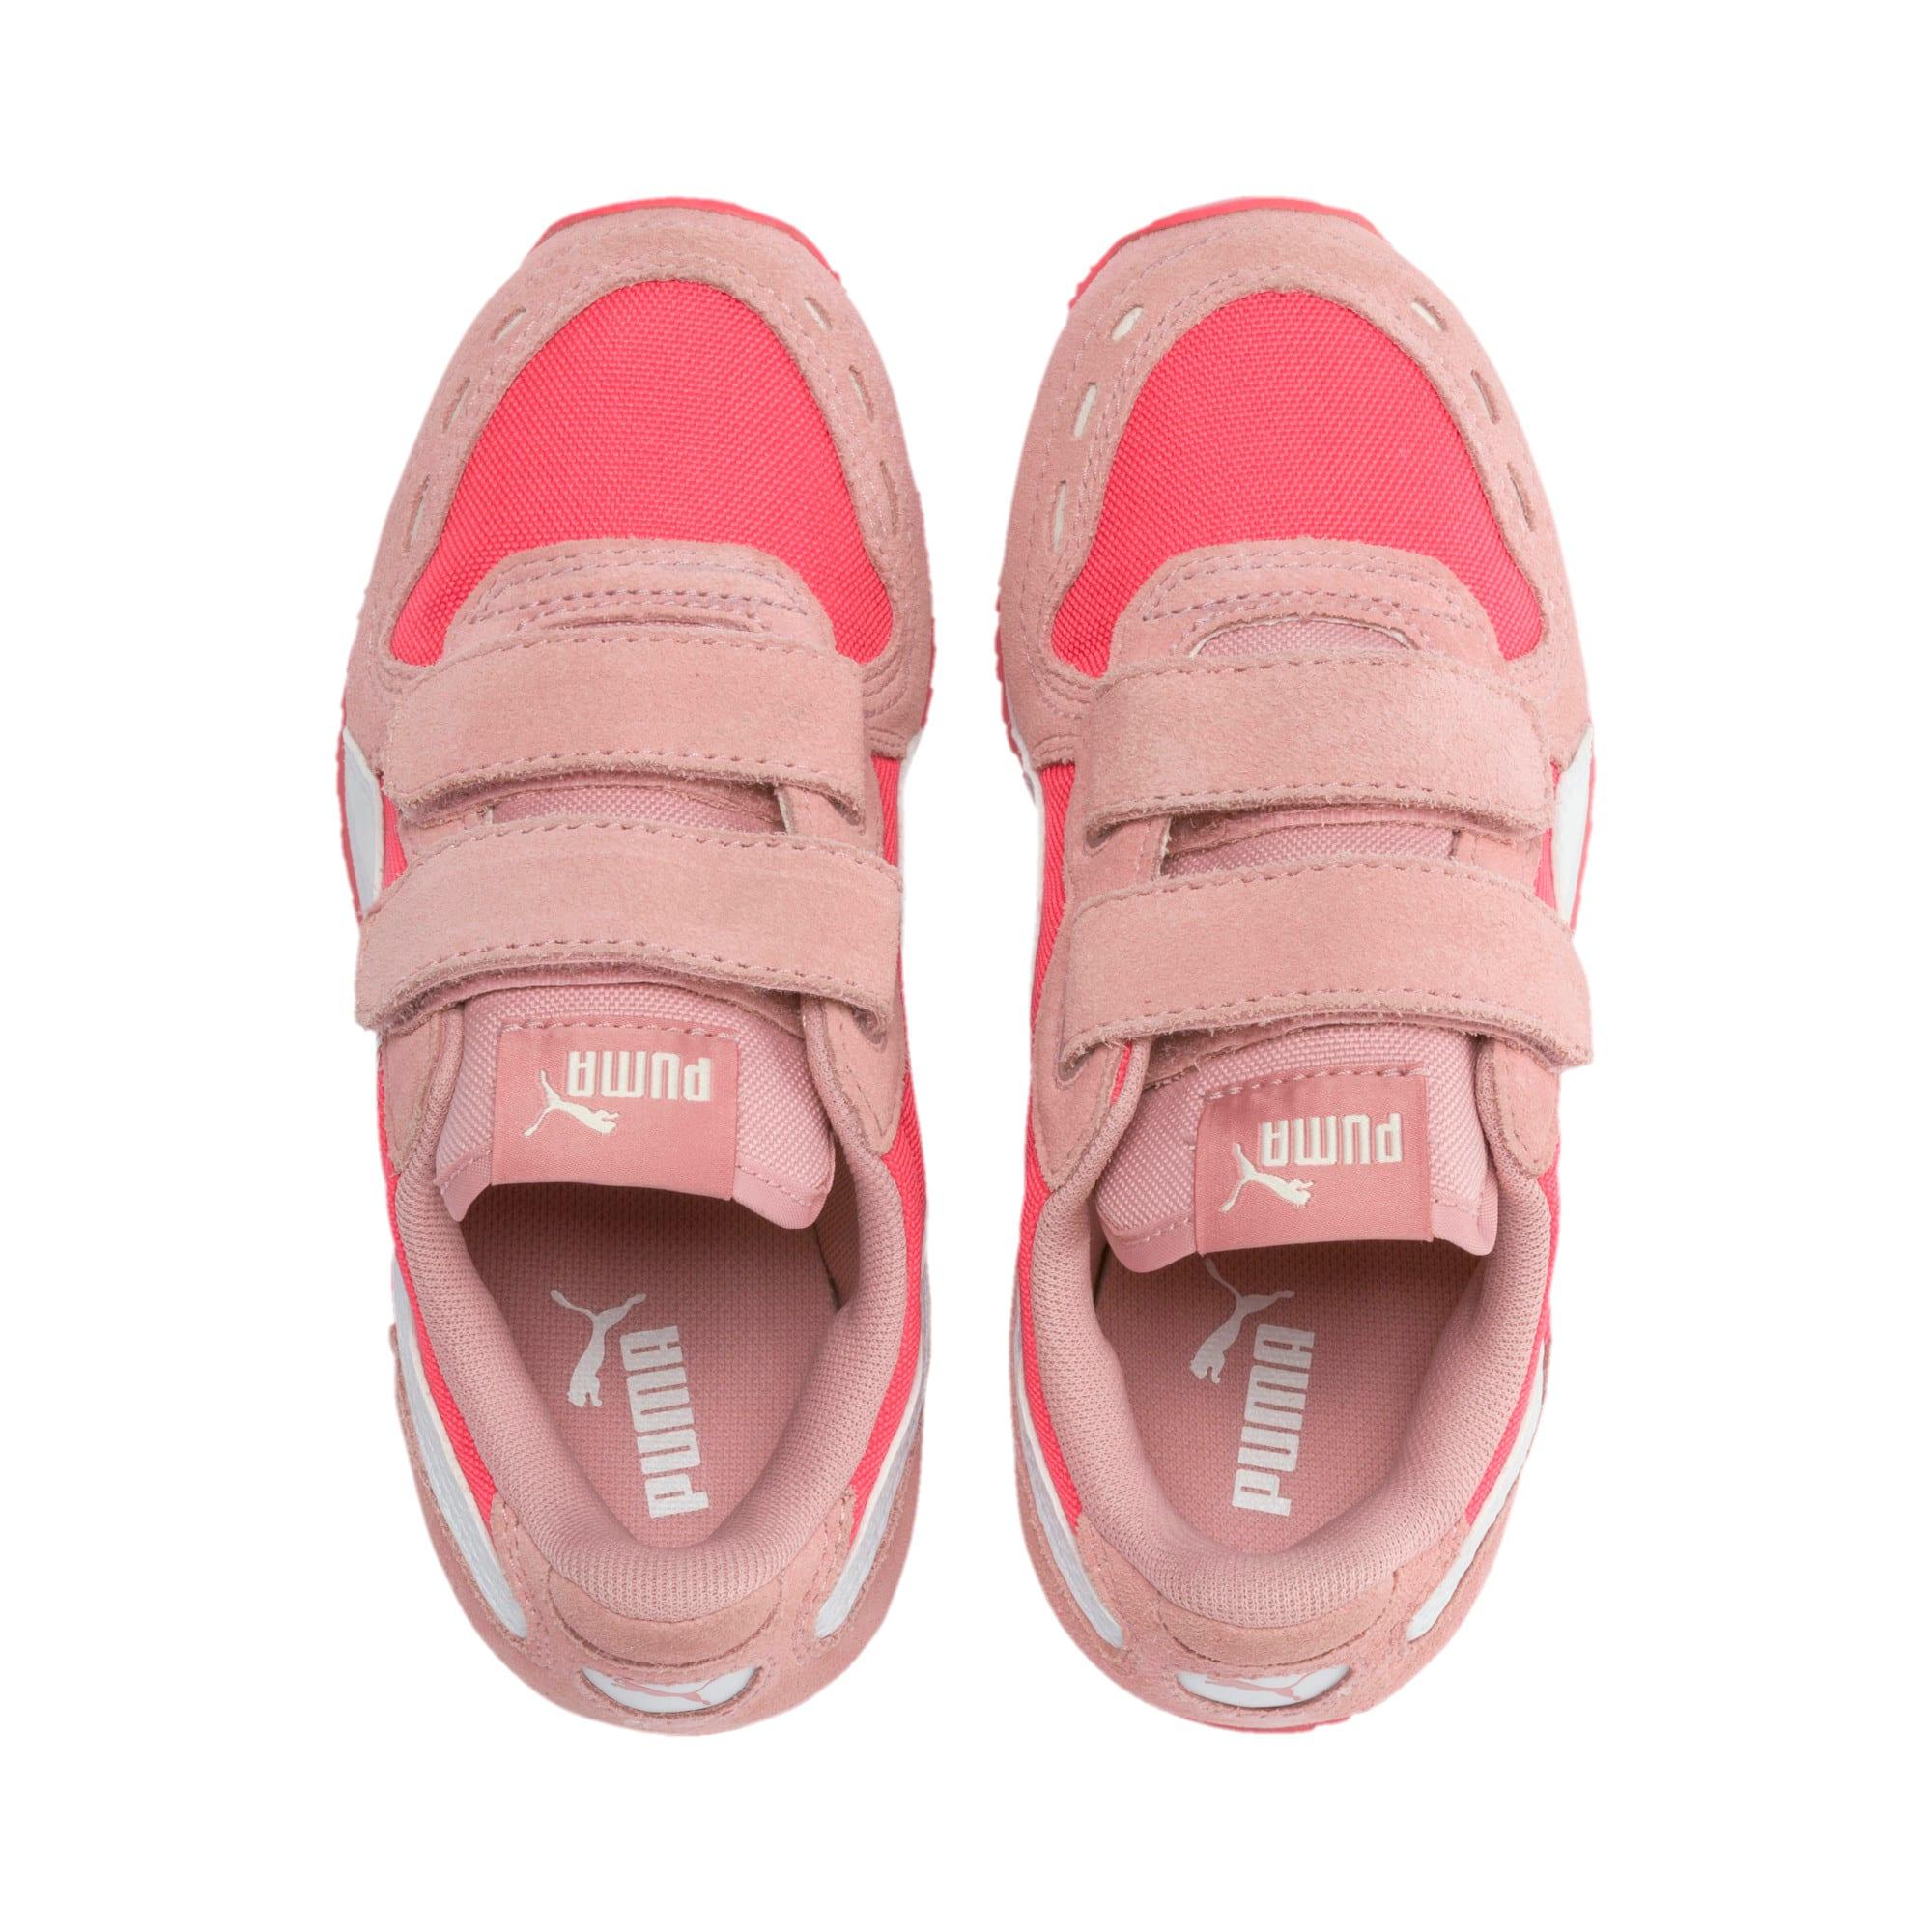 Miniatura 6 de Zapatos Cabana Racer para niño pequeño, Calypso Coral-Bridal Rose, mediano